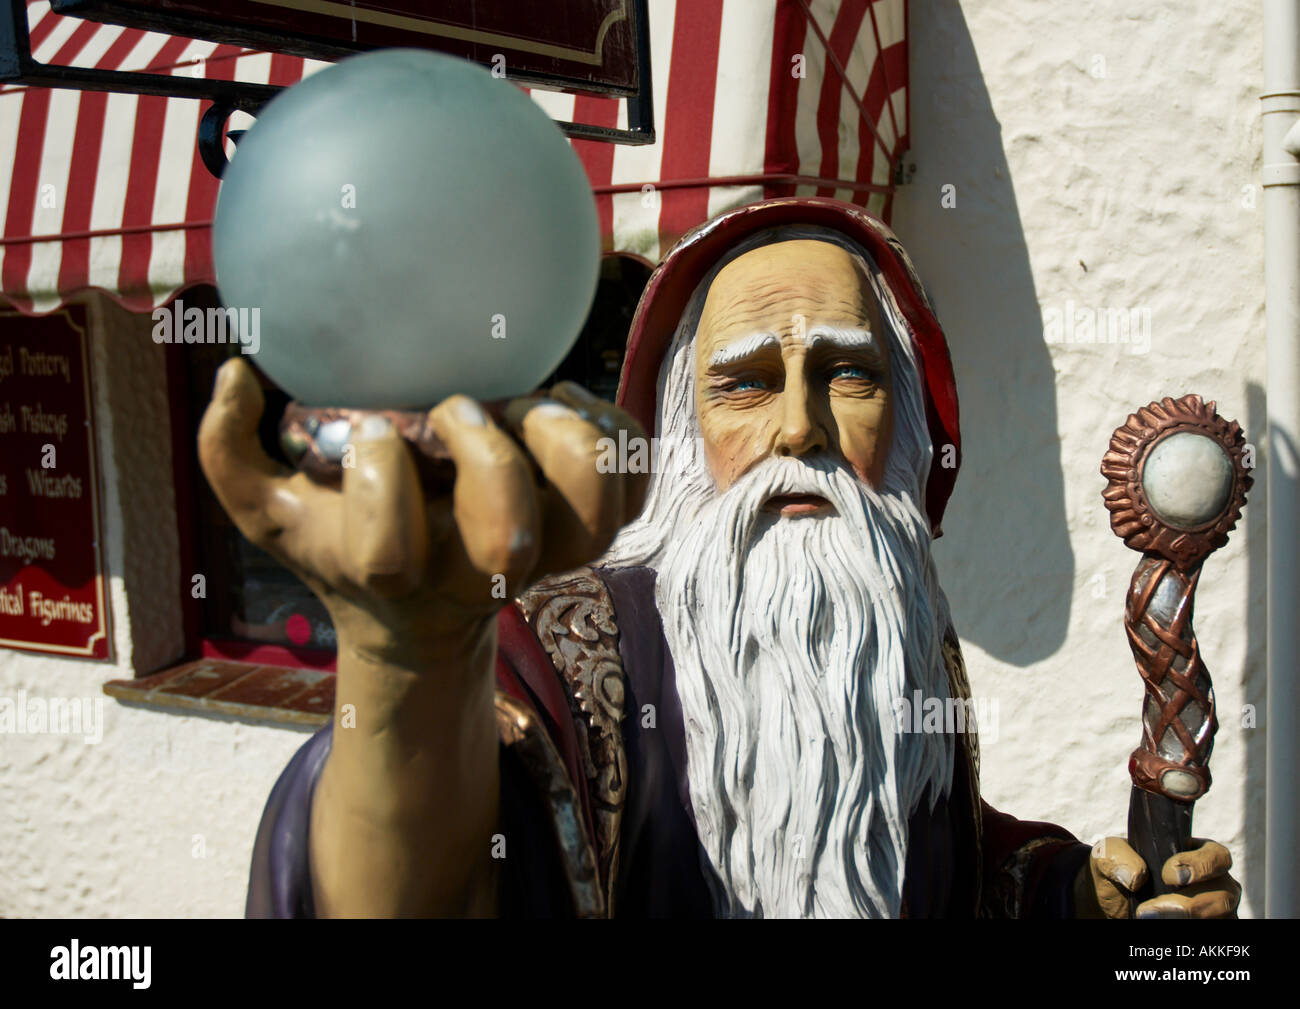 Merlin Wizard Stock Photos & Merlin Wizard Stock Images - Alamy